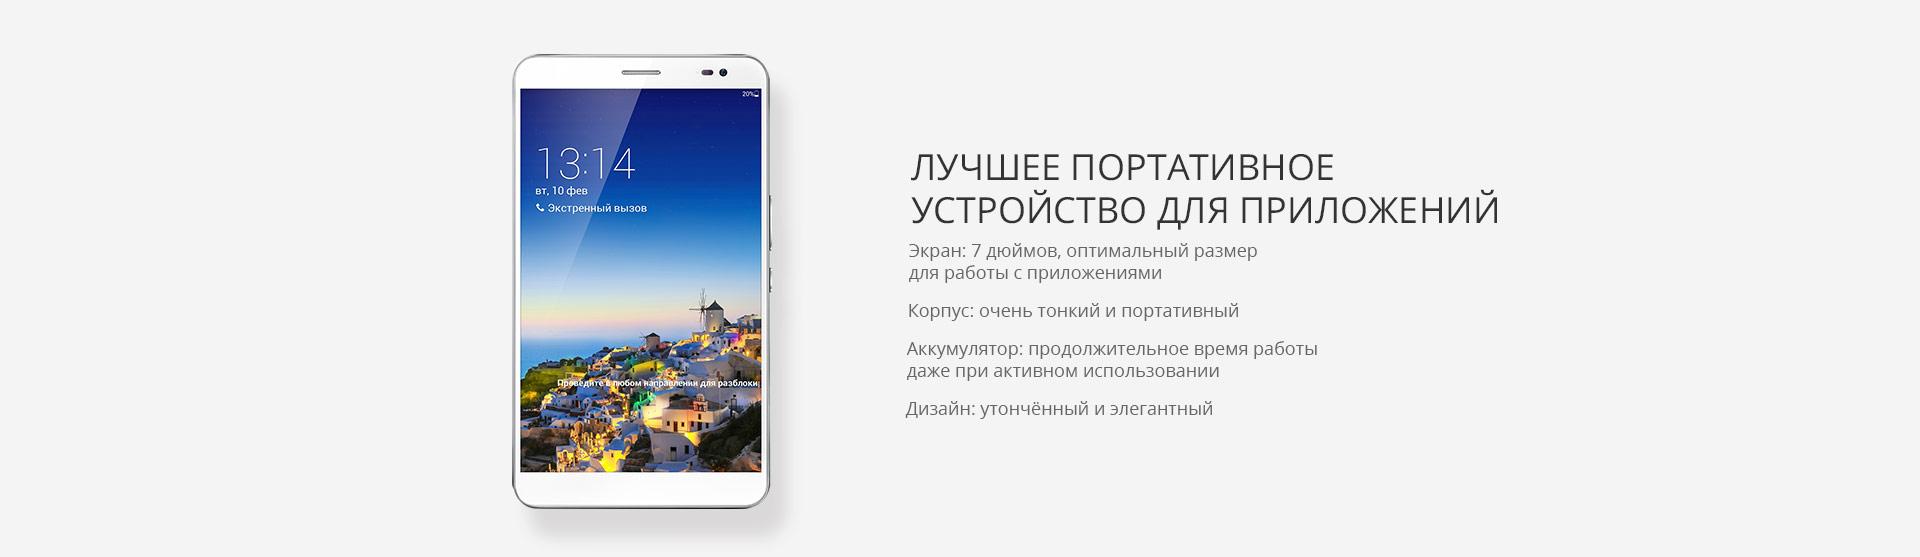 Aliexpress: Скидка 100$ на планшет HUAWEI MEDIAPAD X1 7.0!